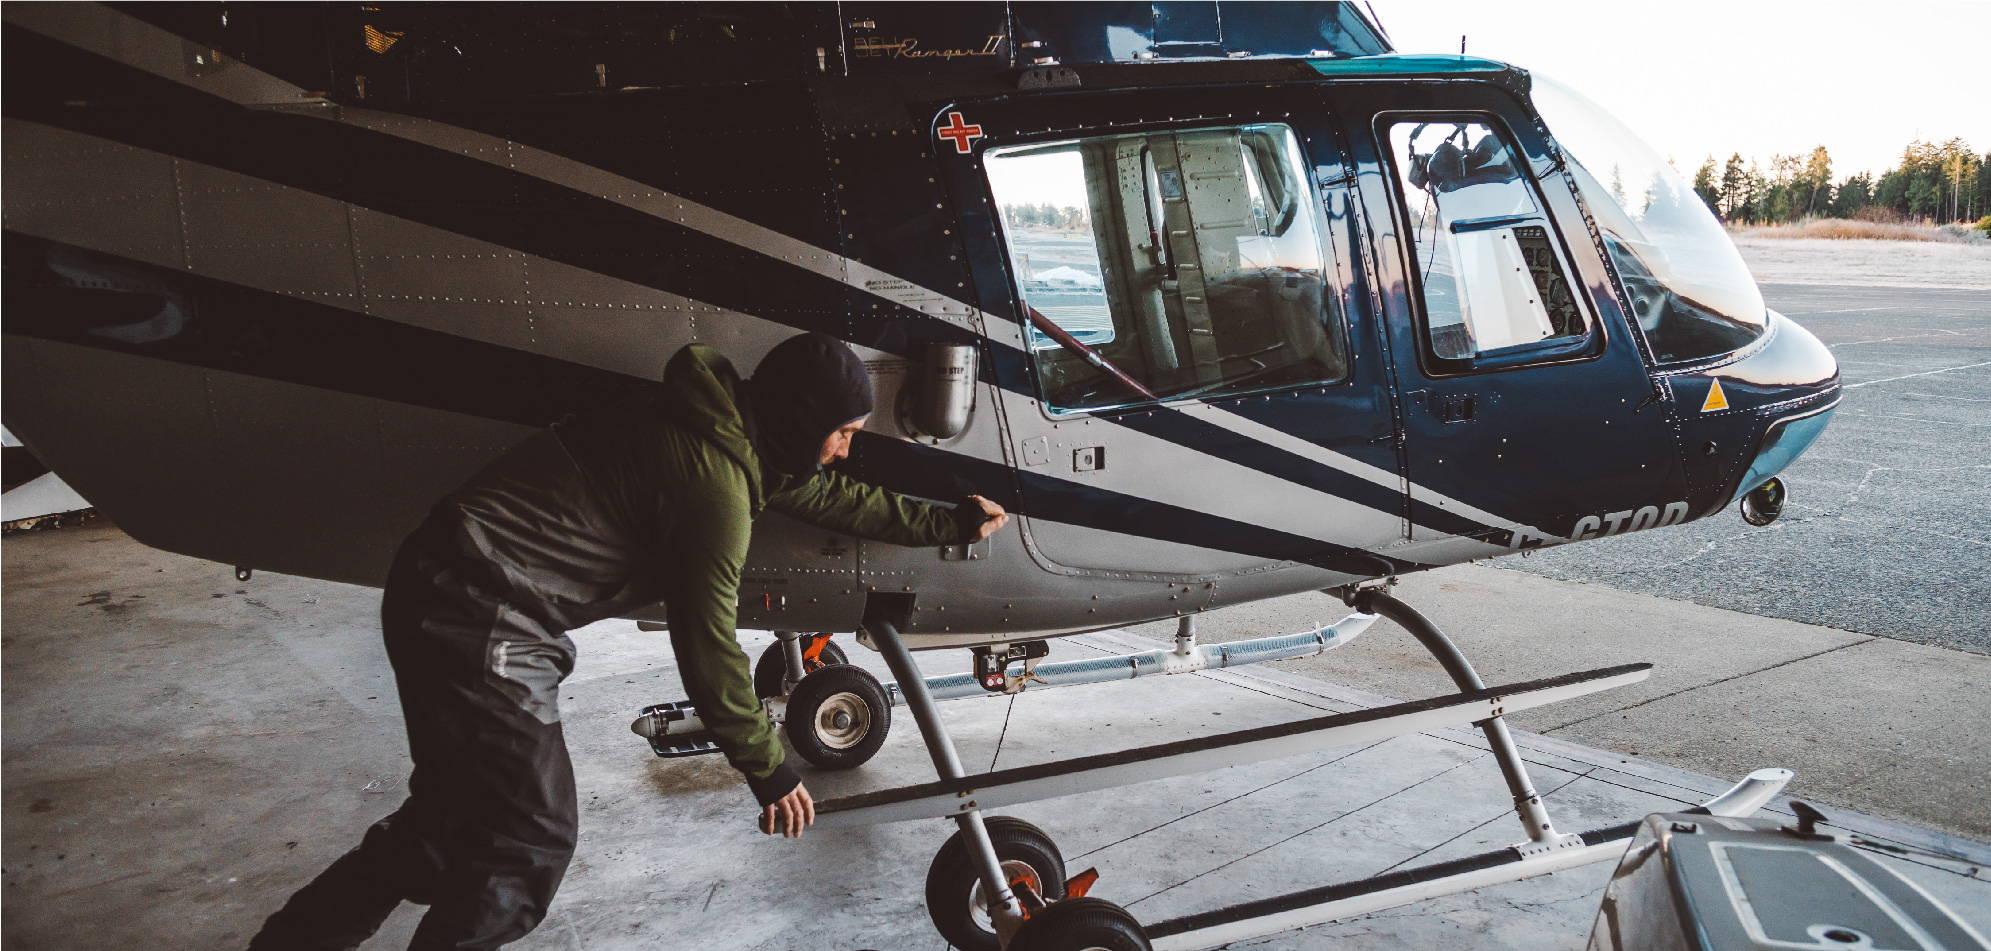 Jeremy Koreski pushing helicopter in hanger | Rumpl